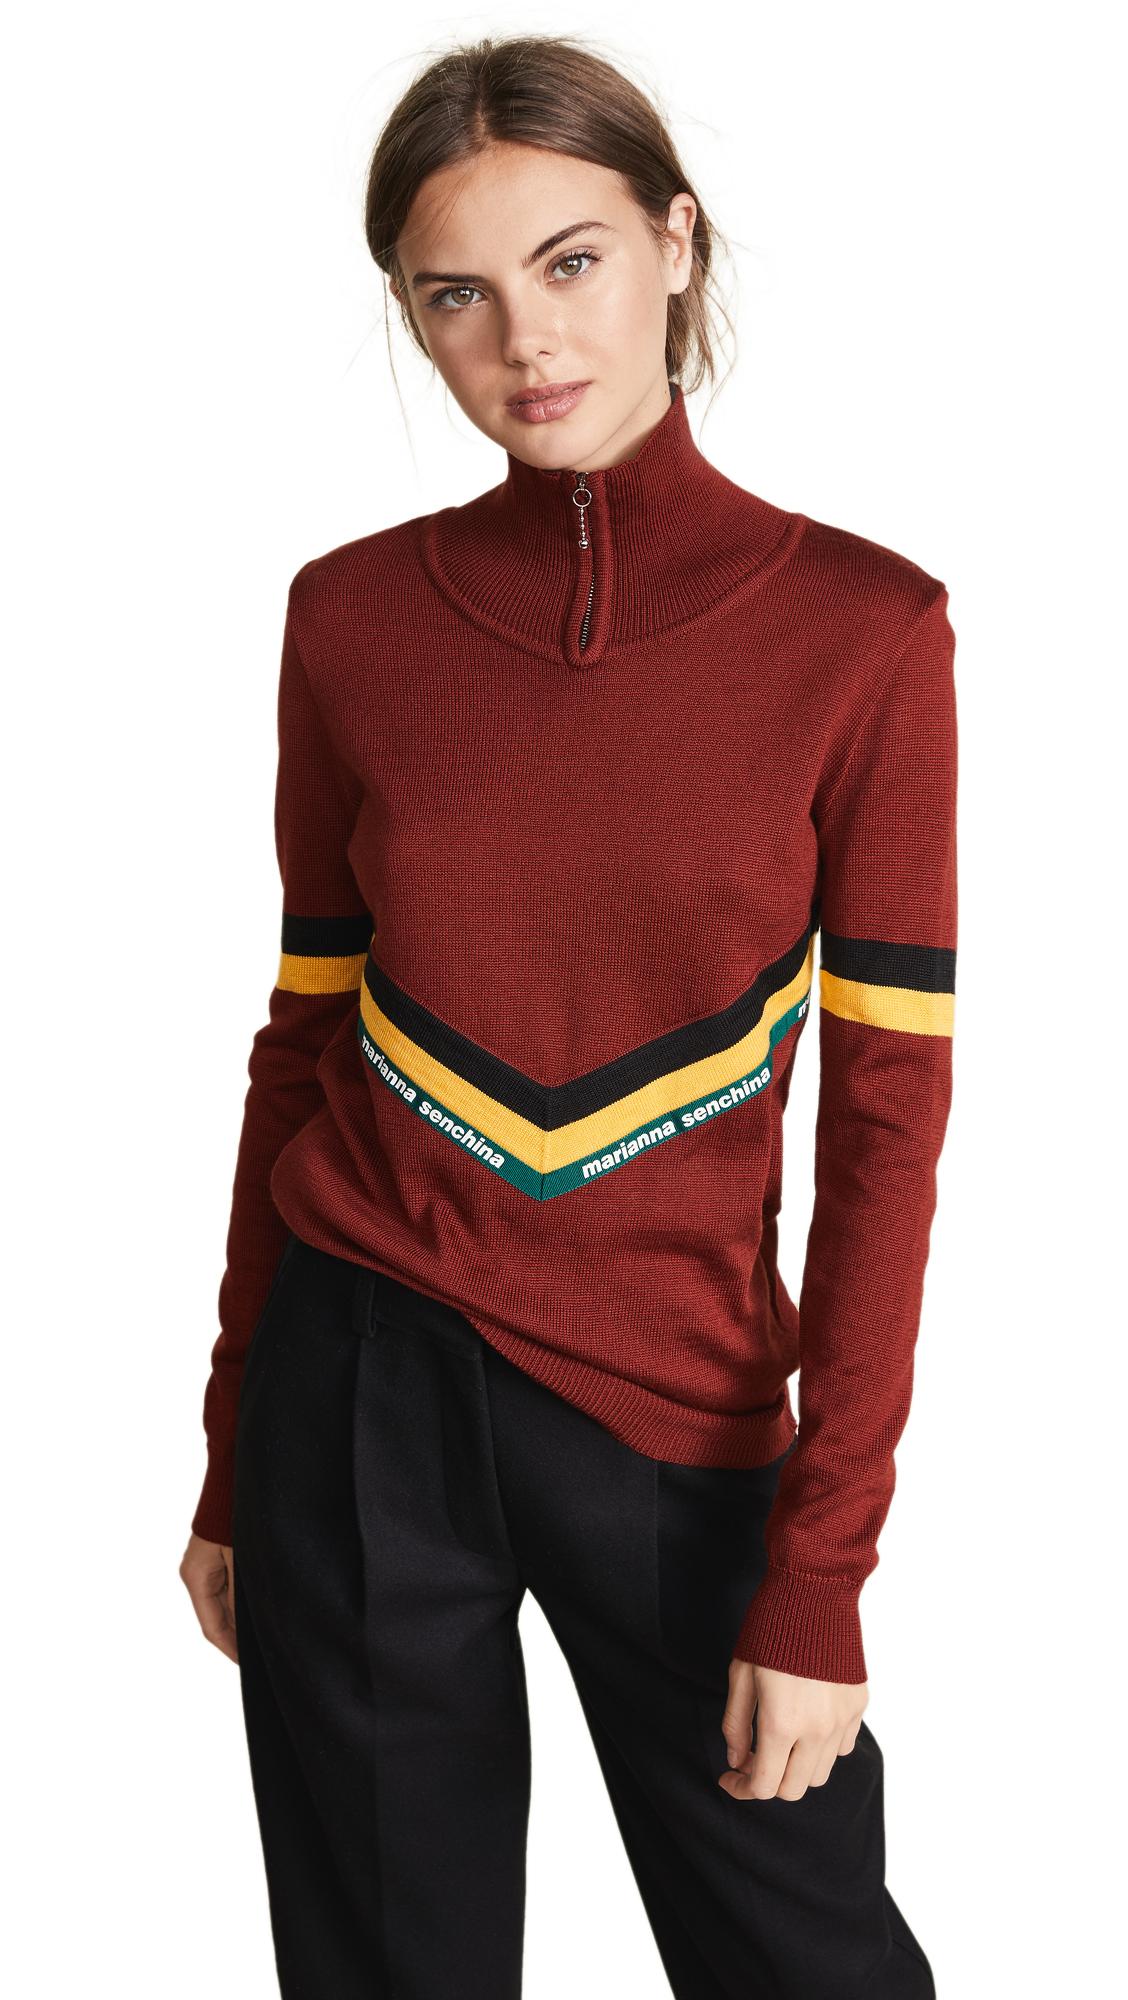 MARIANNA SENCHINA Turtleneck Sweater in Bordeaux/Black